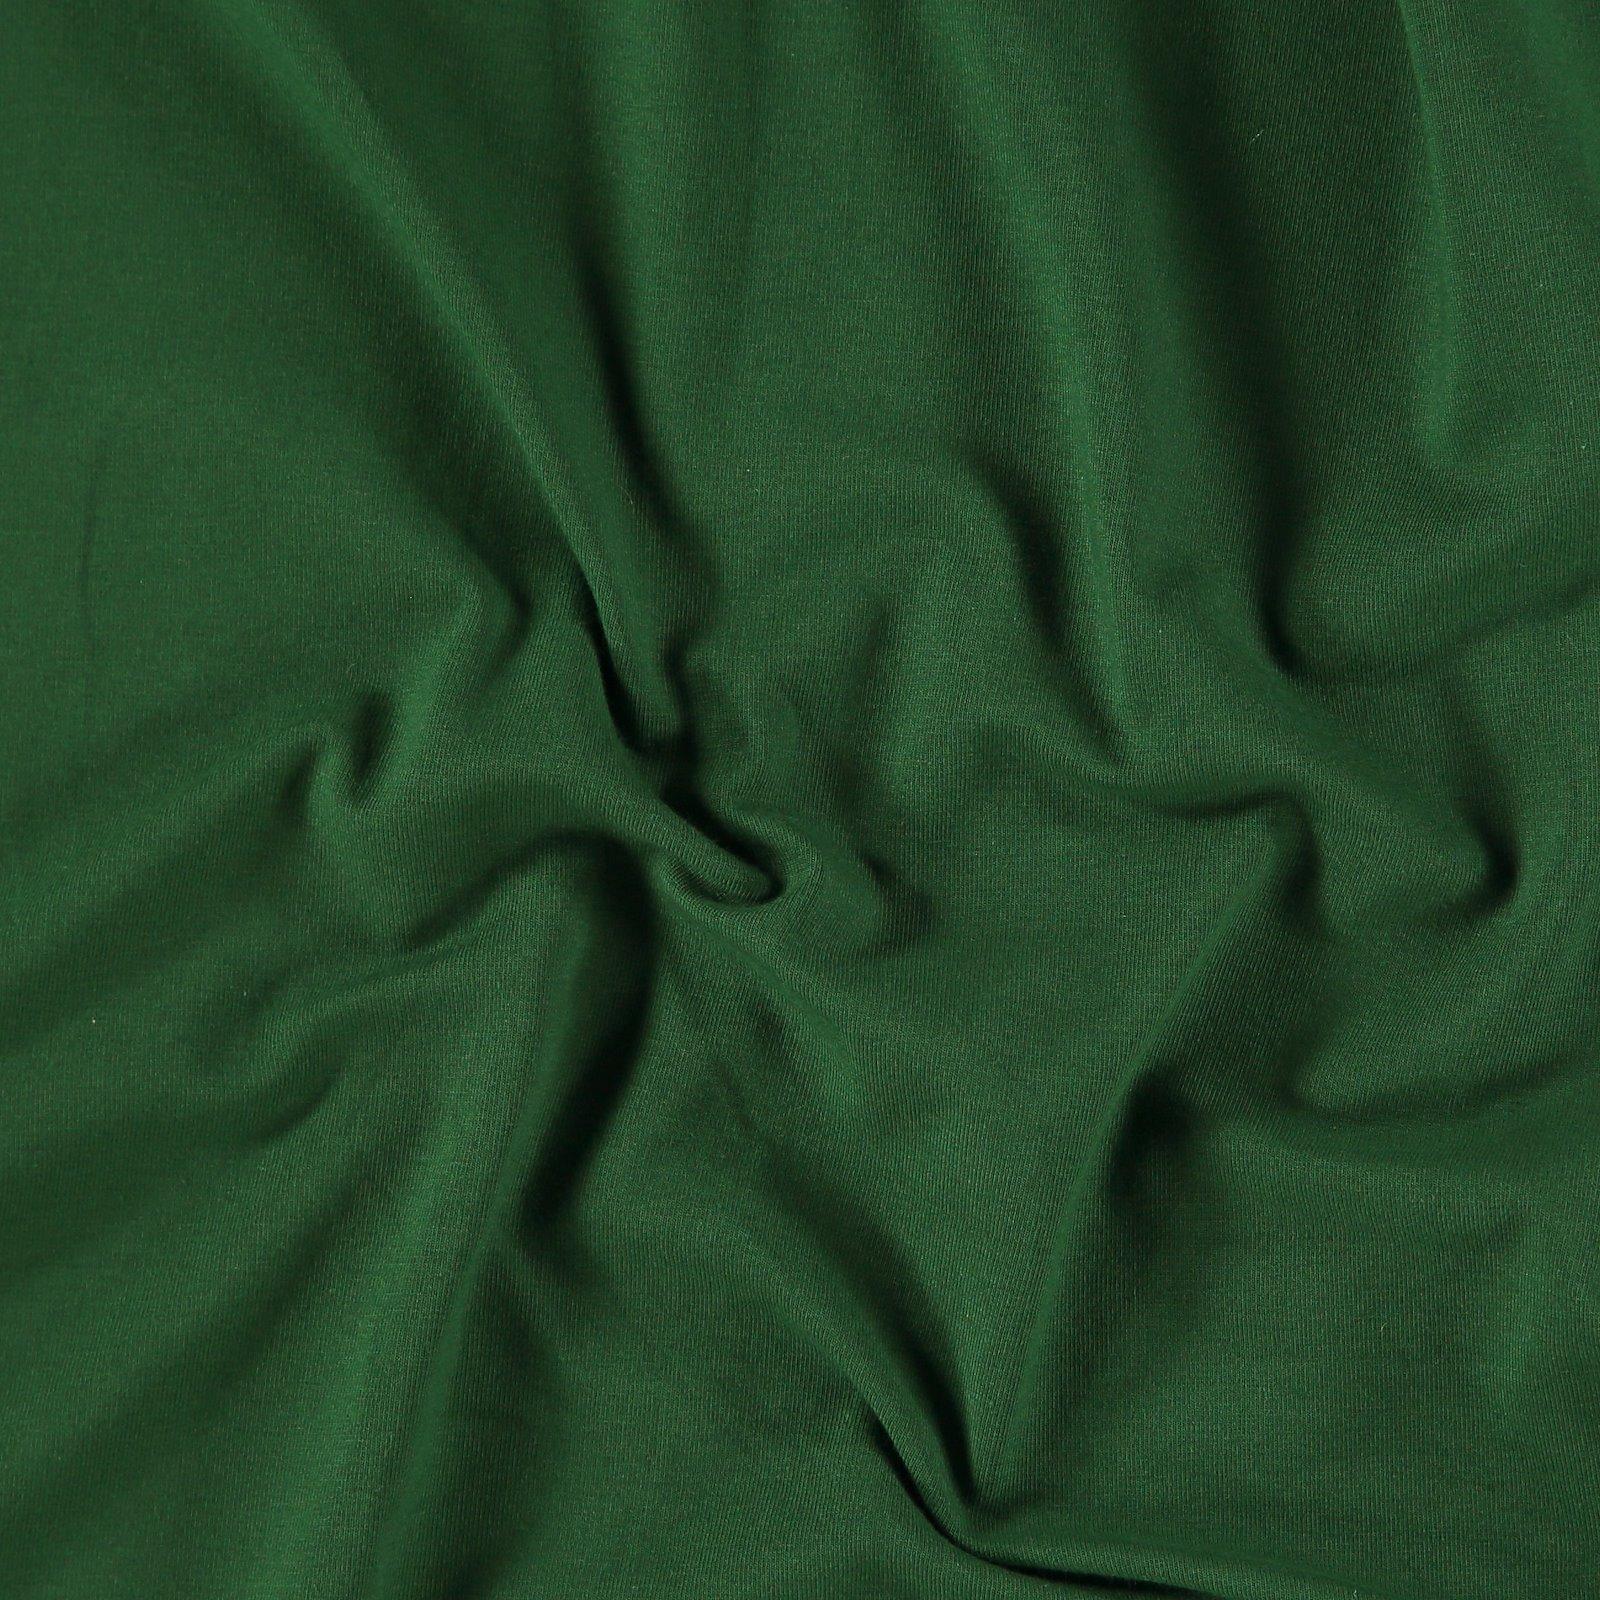 Organic stretch jersey dark green